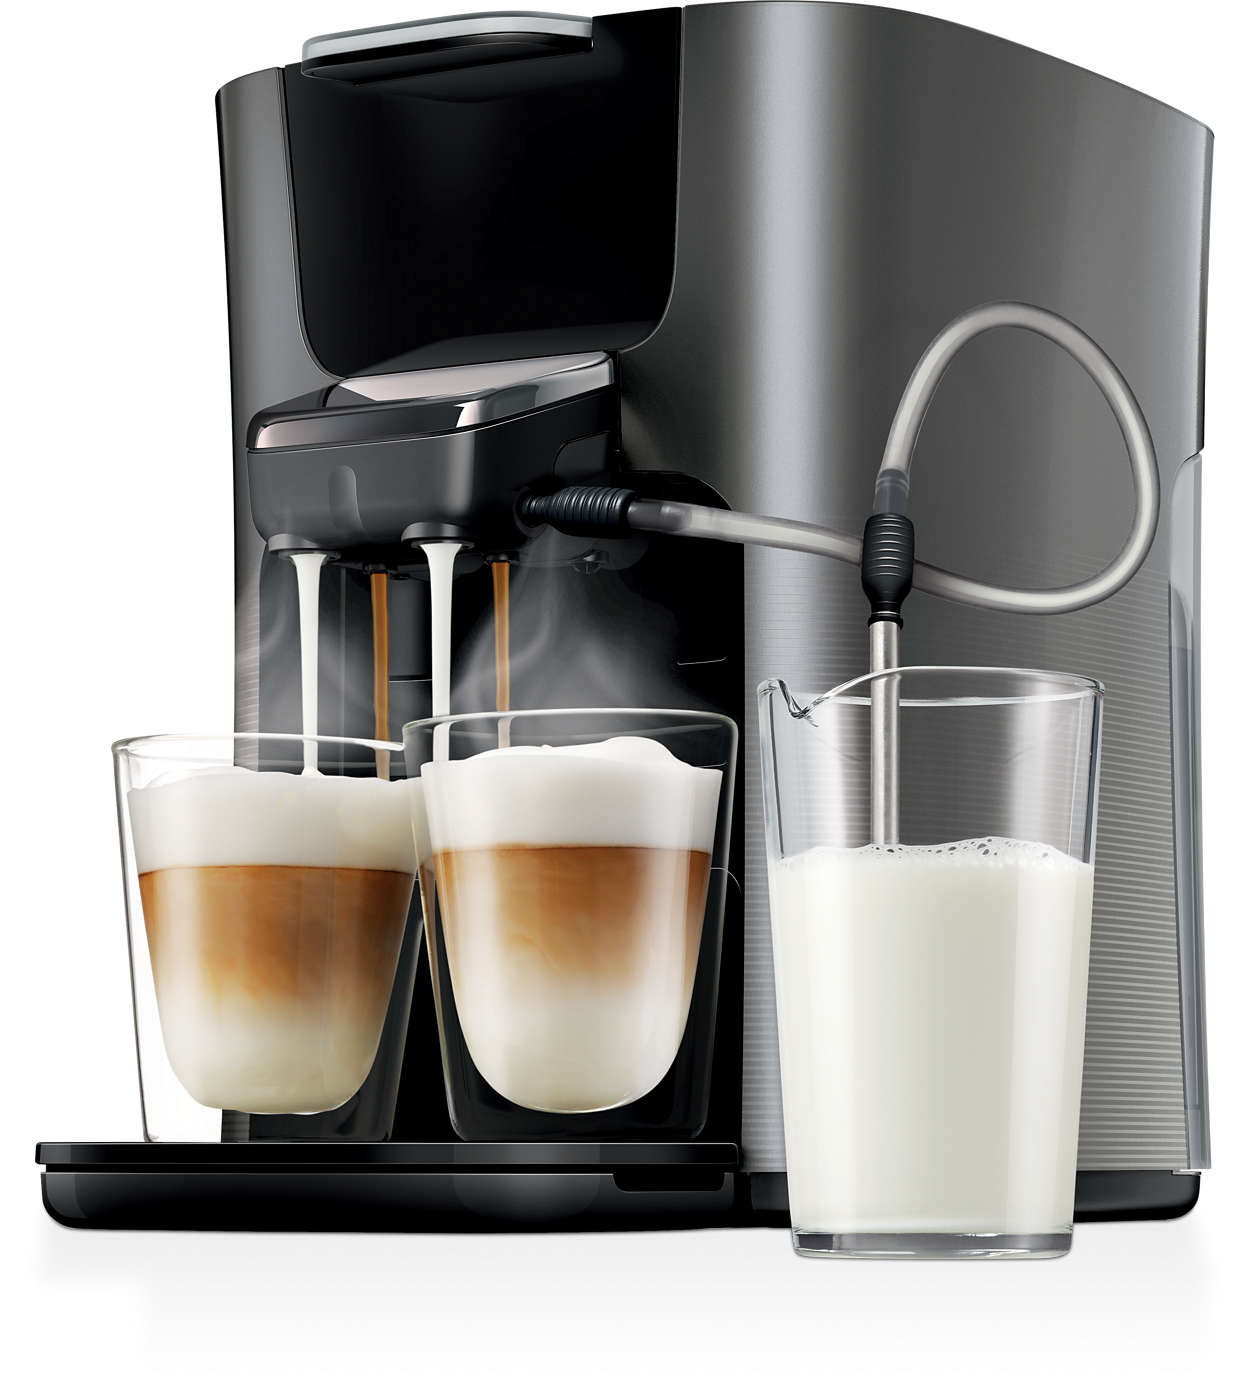 latte duo plus machine caf dosettes hd7857 50 senseo. Black Bedroom Furniture Sets. Home Design Ideas